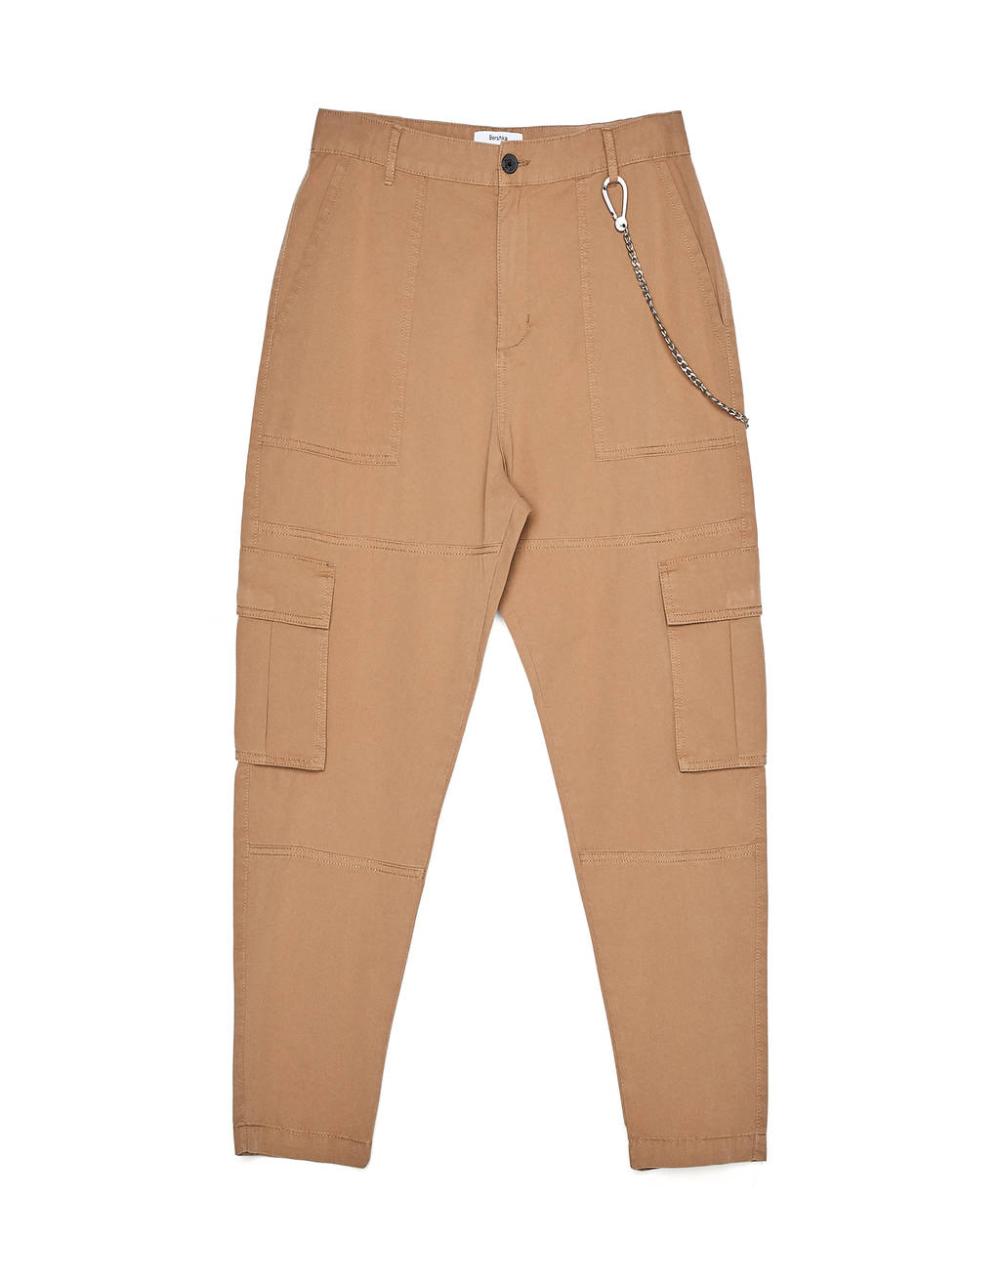 Pantalon Cargo Con Cadena Pantalones Bershka Honduras Pantalones Bershka Pantalones Con Cadenas Pantalones Cargo